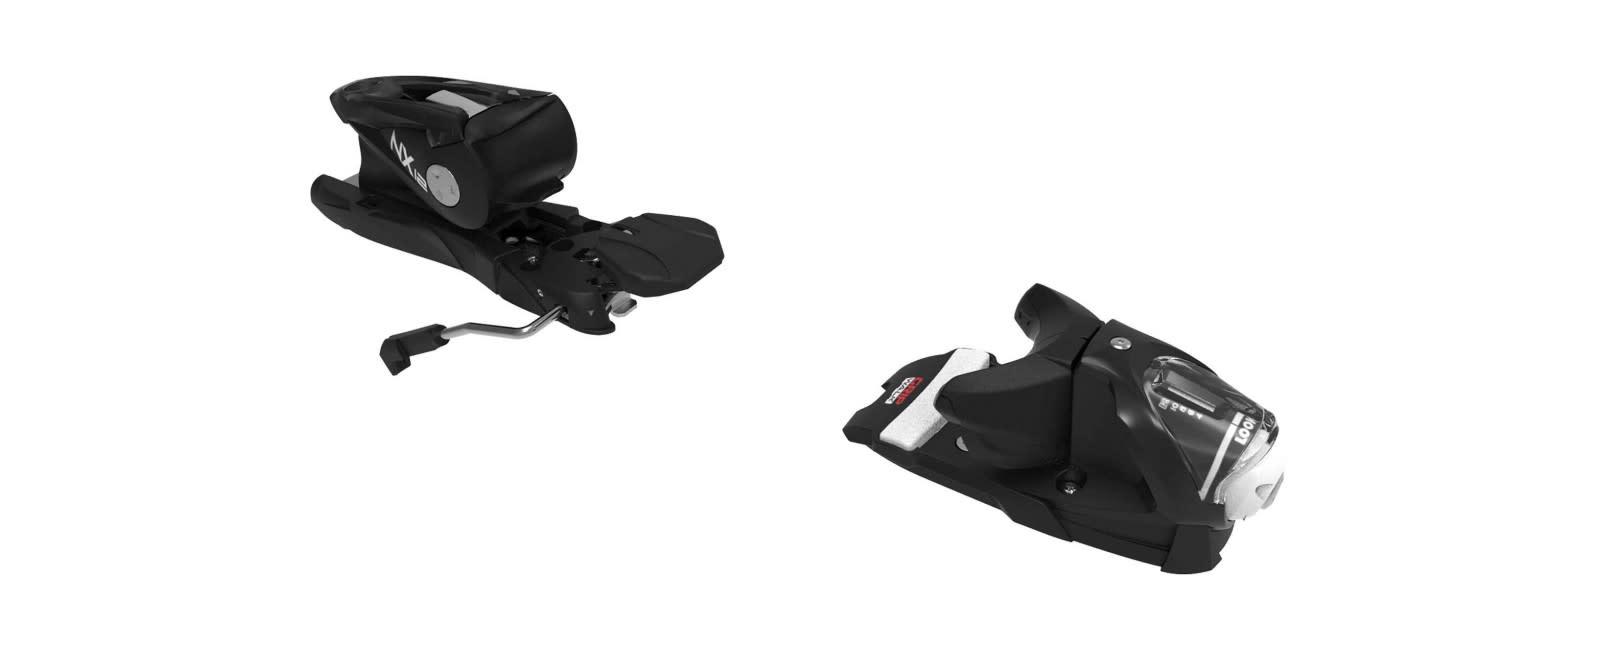 LOOK Look NX 12 GW Ski Binding (2021)